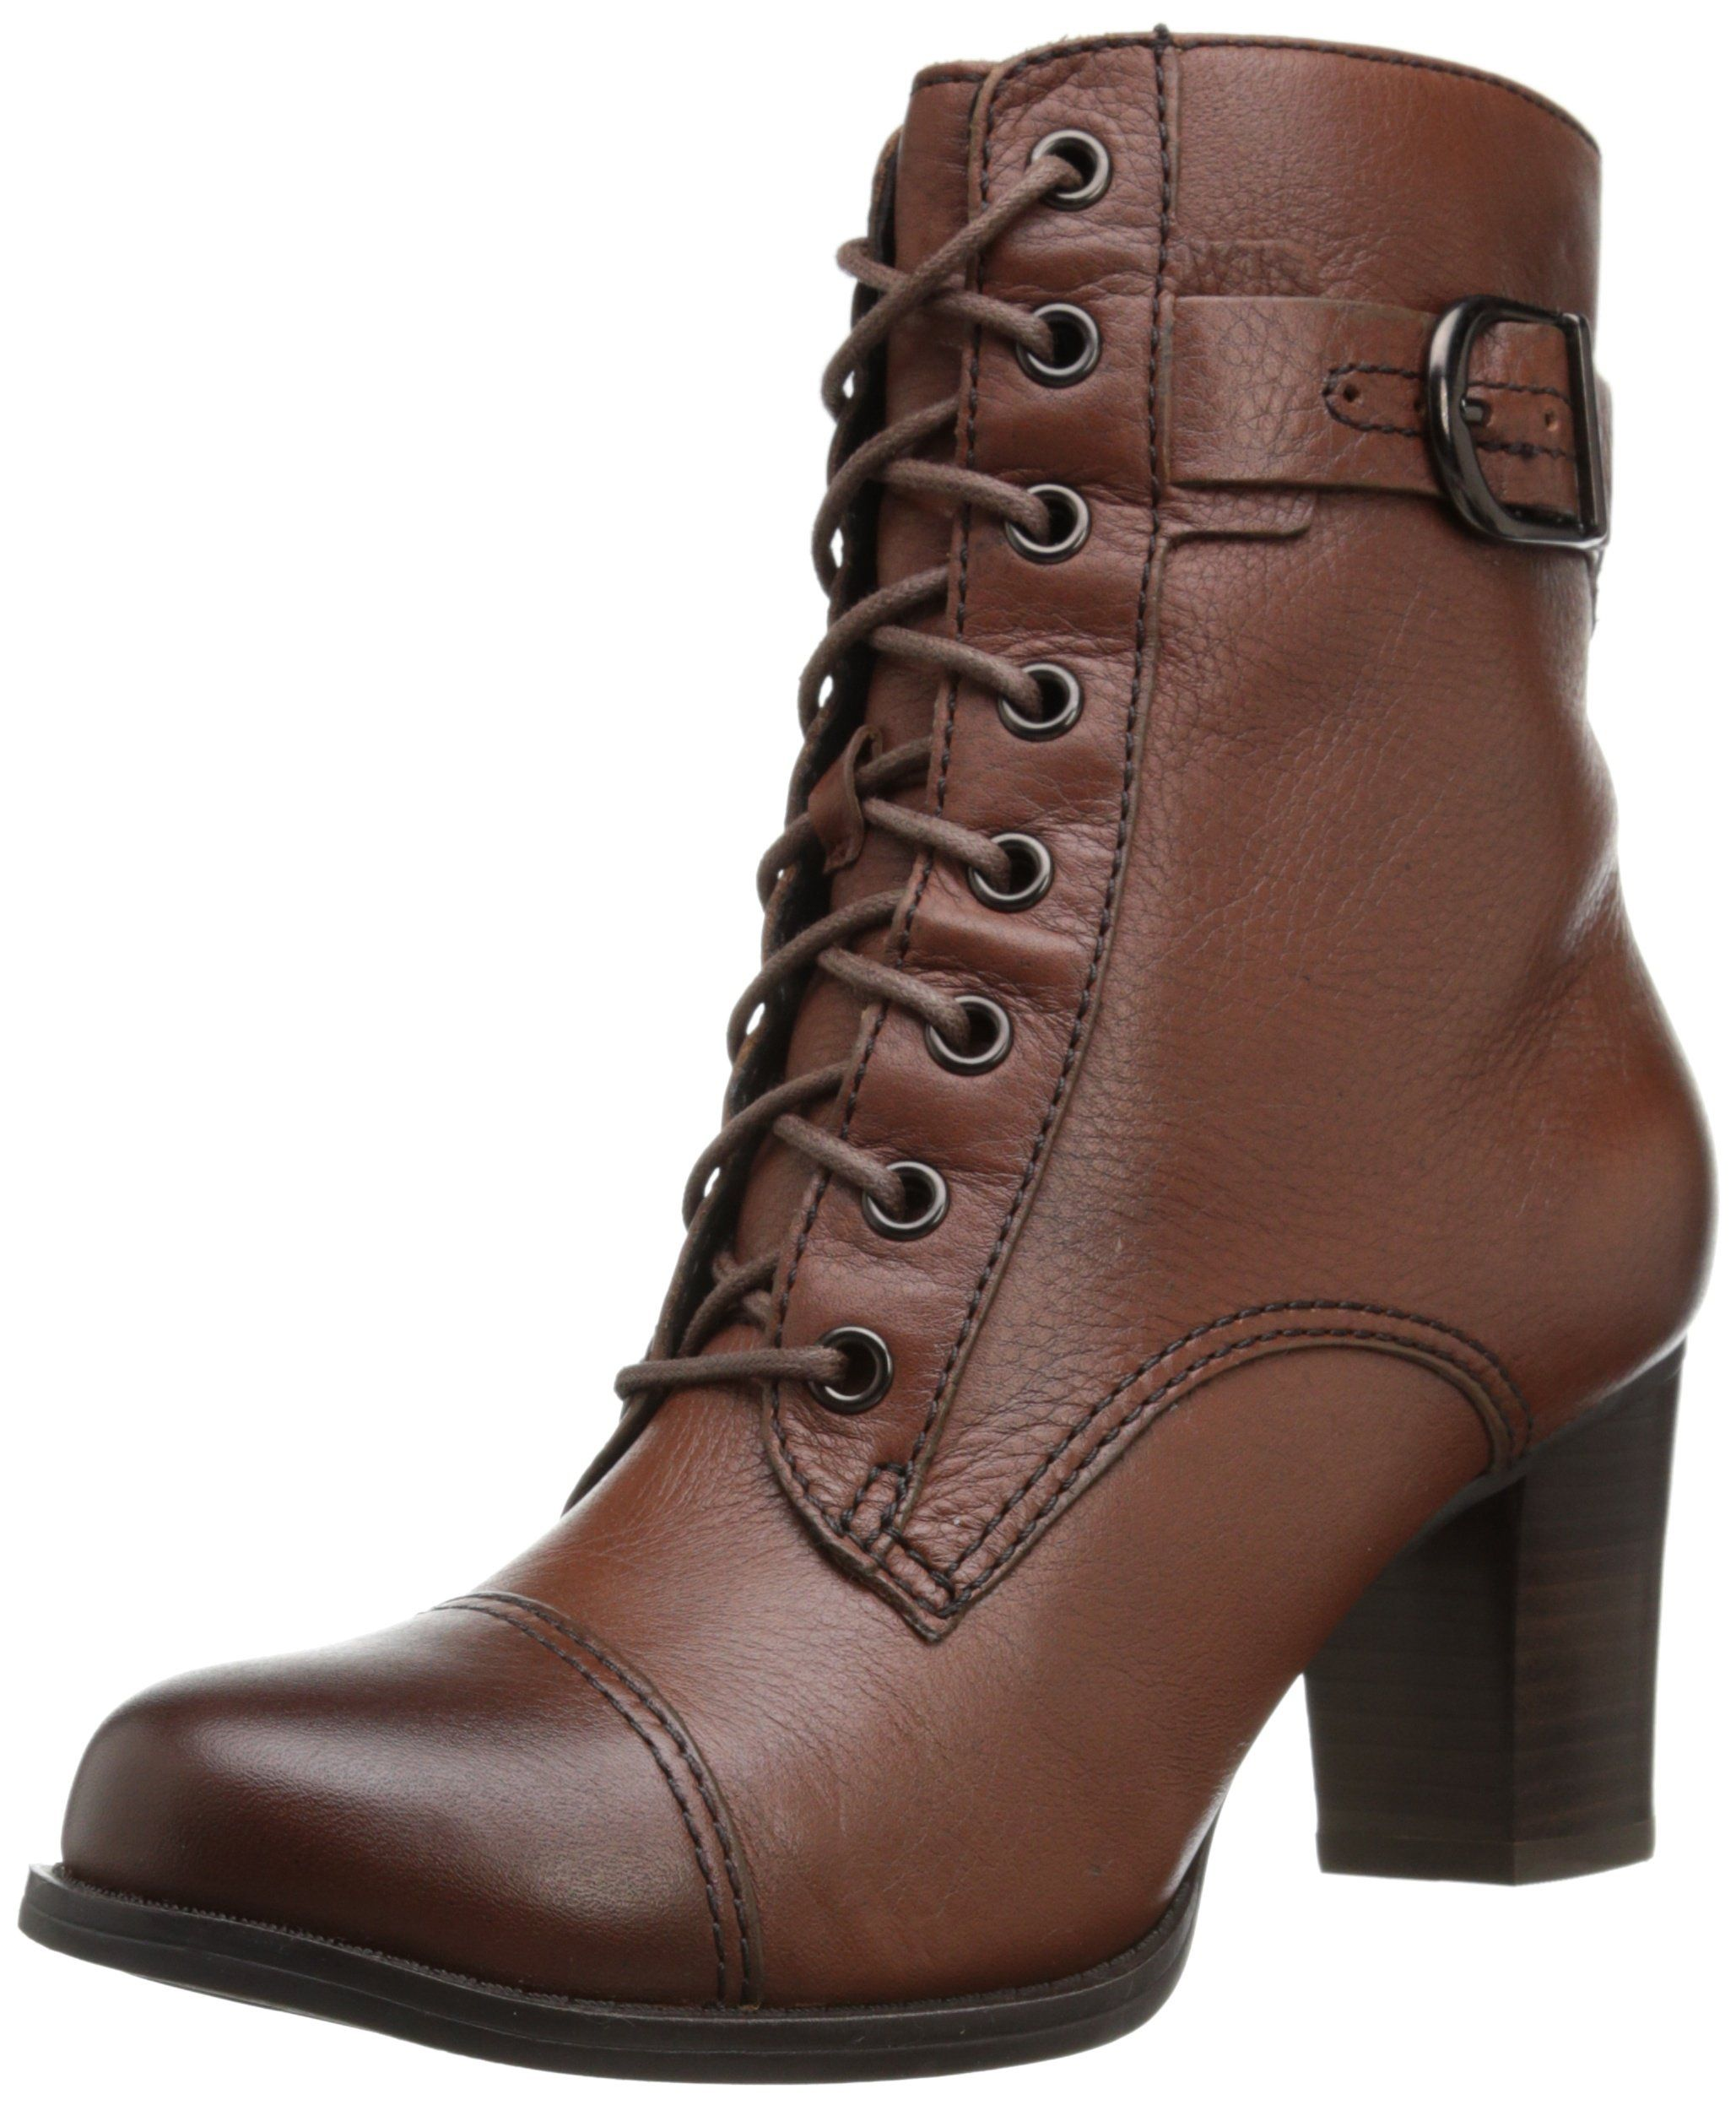 67b7365046ef4 Amazon.com: Clarks Women's Jolissa Gypsum Boot: Black Leather Lace ...